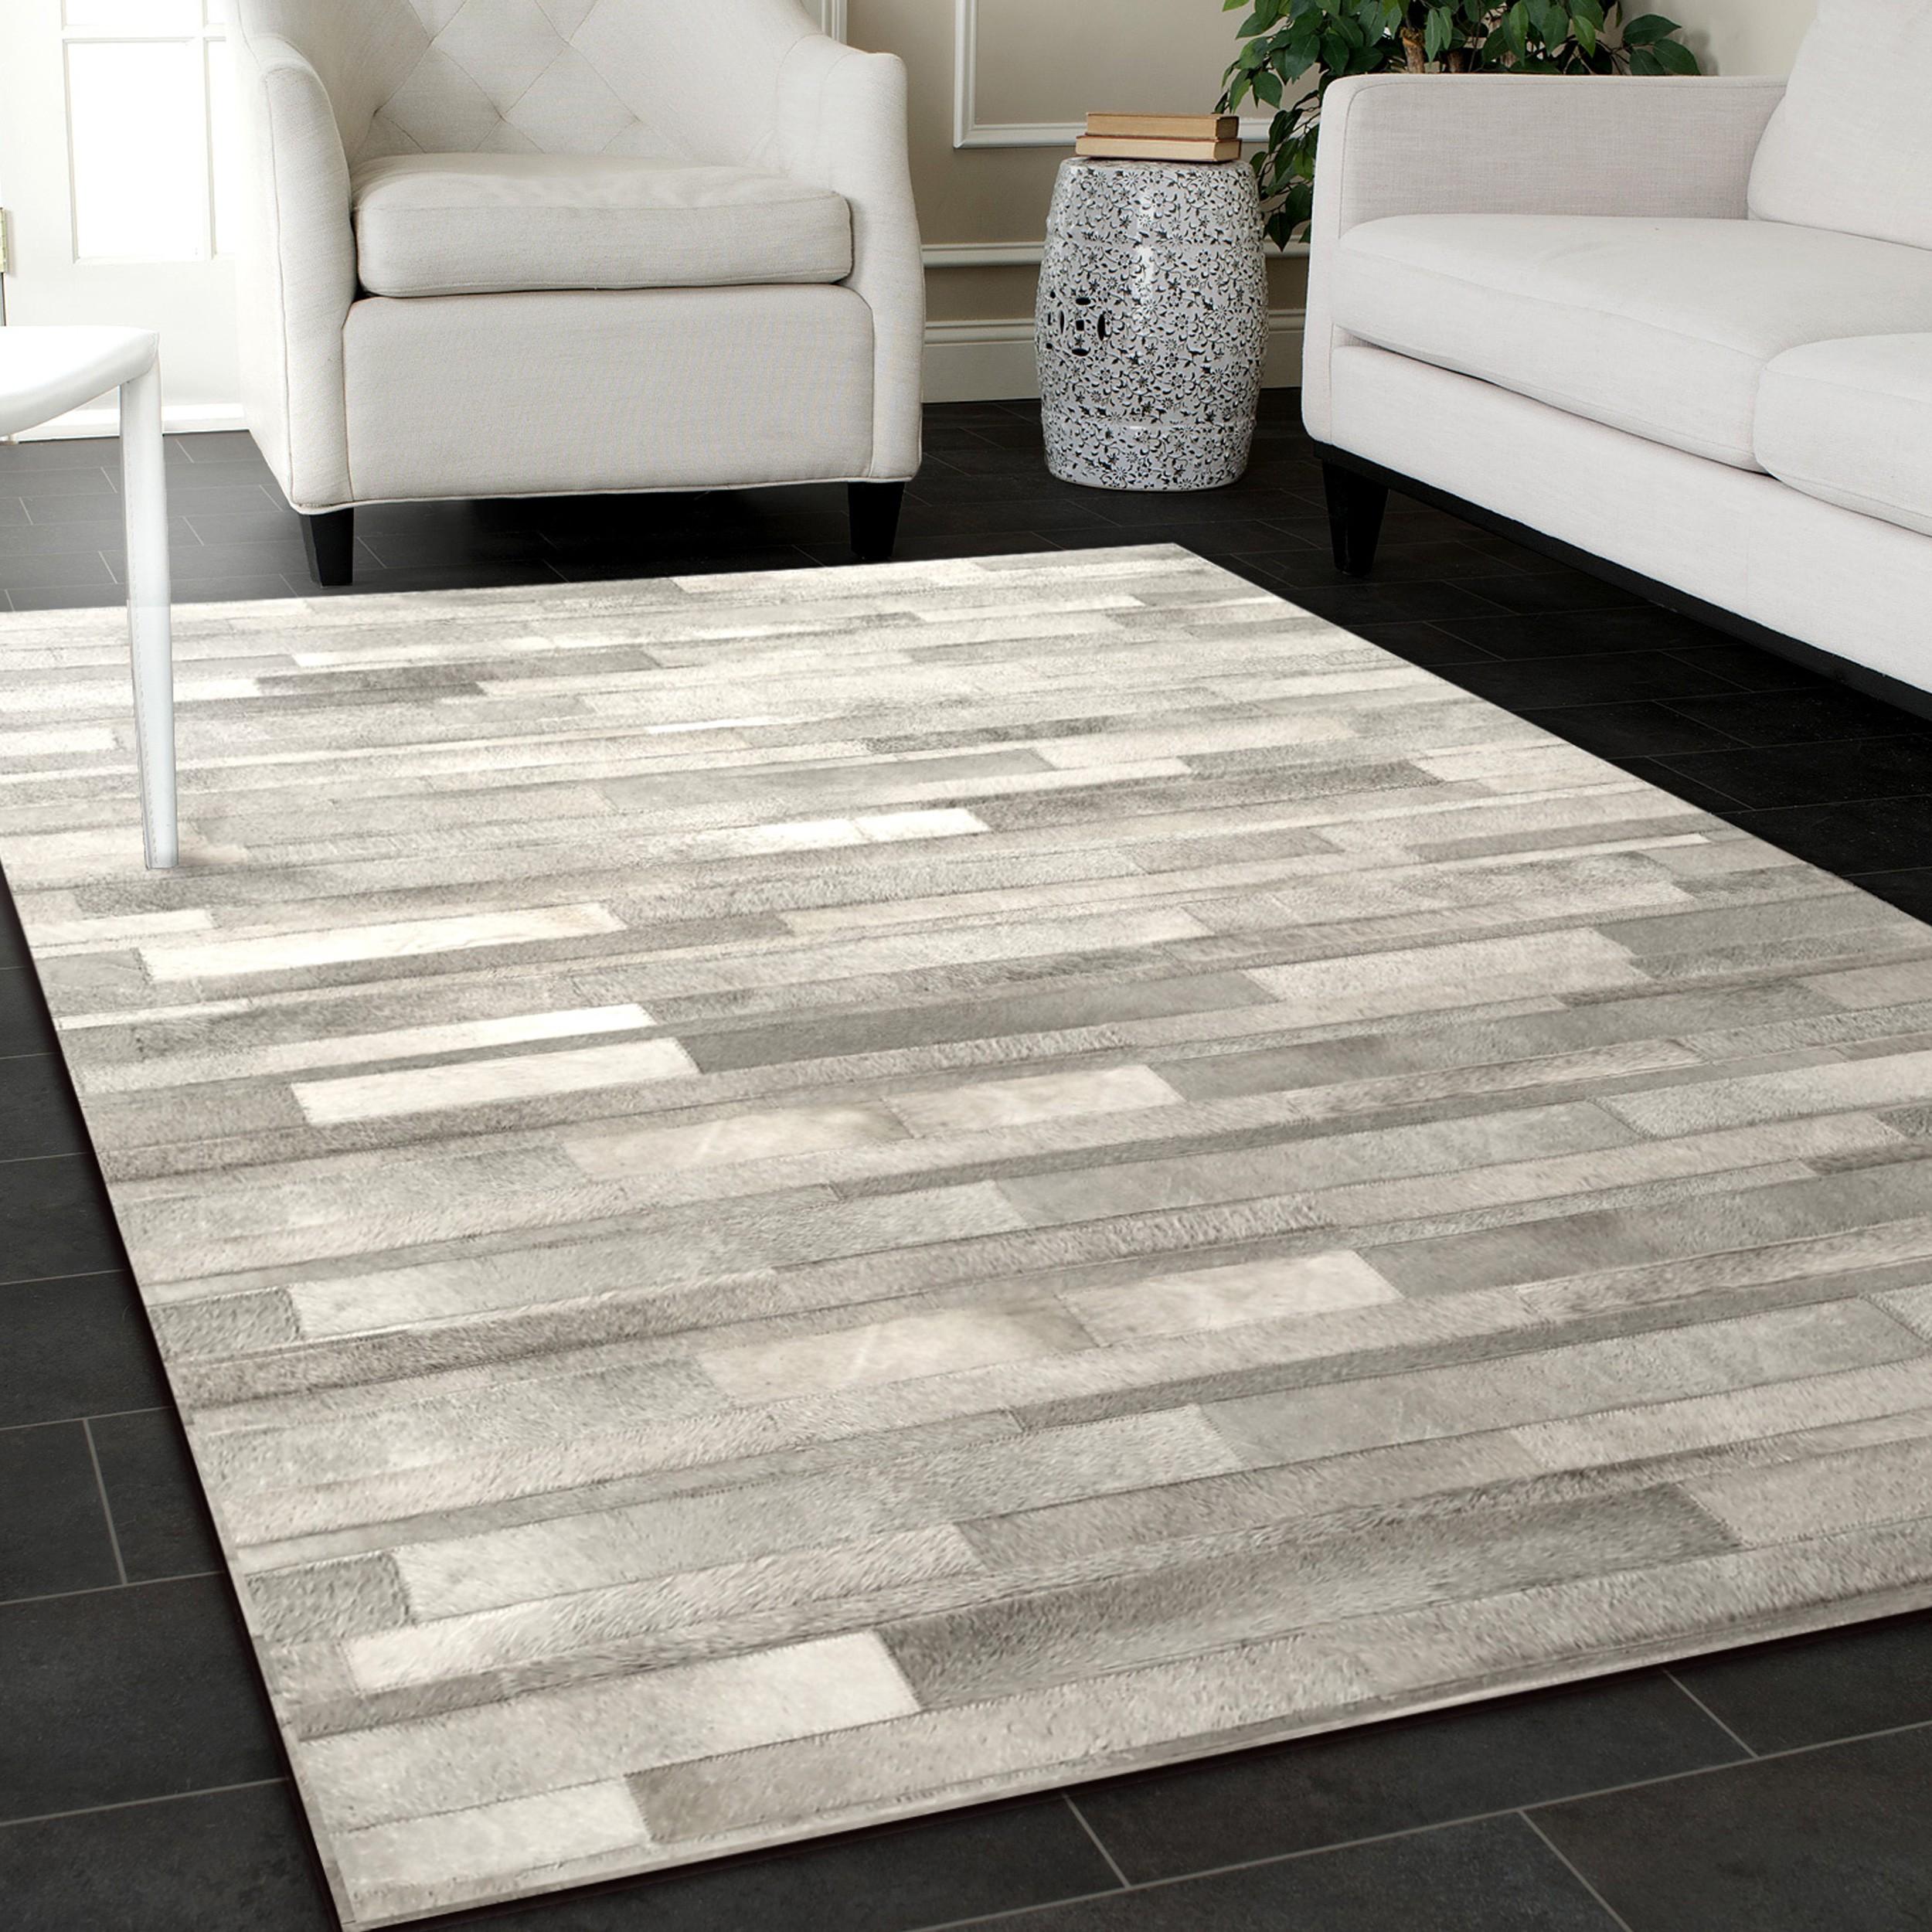 acheter tapis cuir gris clair - Tapis Gris